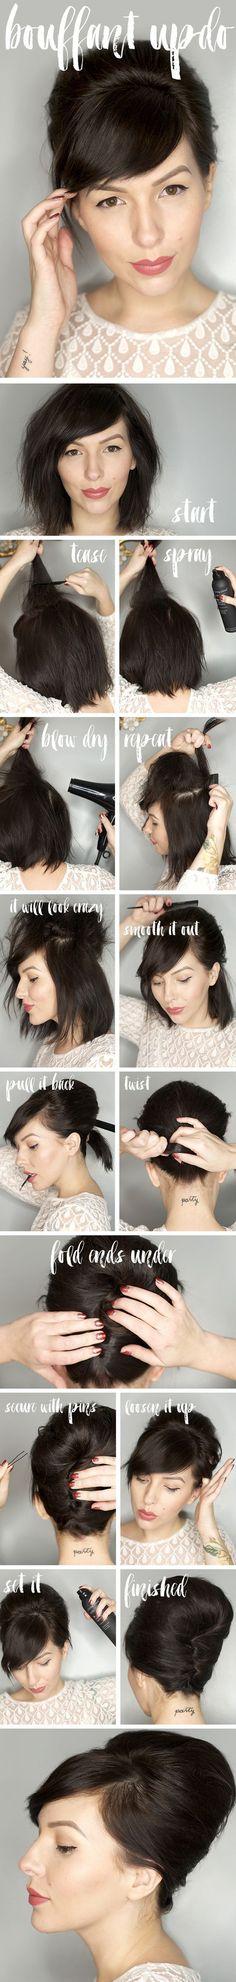 Bouffant Updo Hair Tutorial | keiko lynn | Bloglovin':